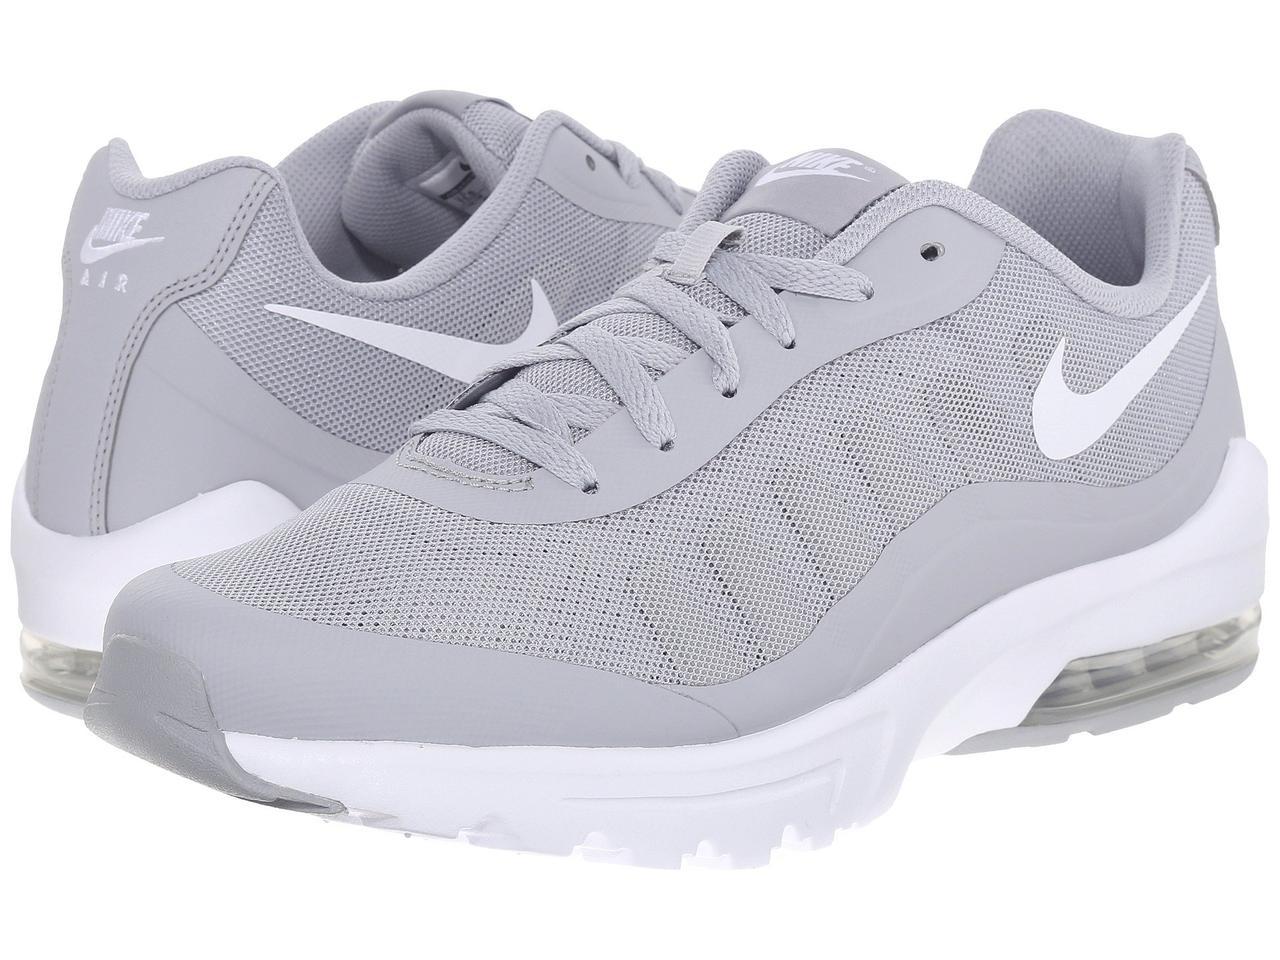 36f8befc2a4e Кроссовки Nike Air Max Invigor Wolf Grey White - Оригинал - FAIR -  оригинальная одежда